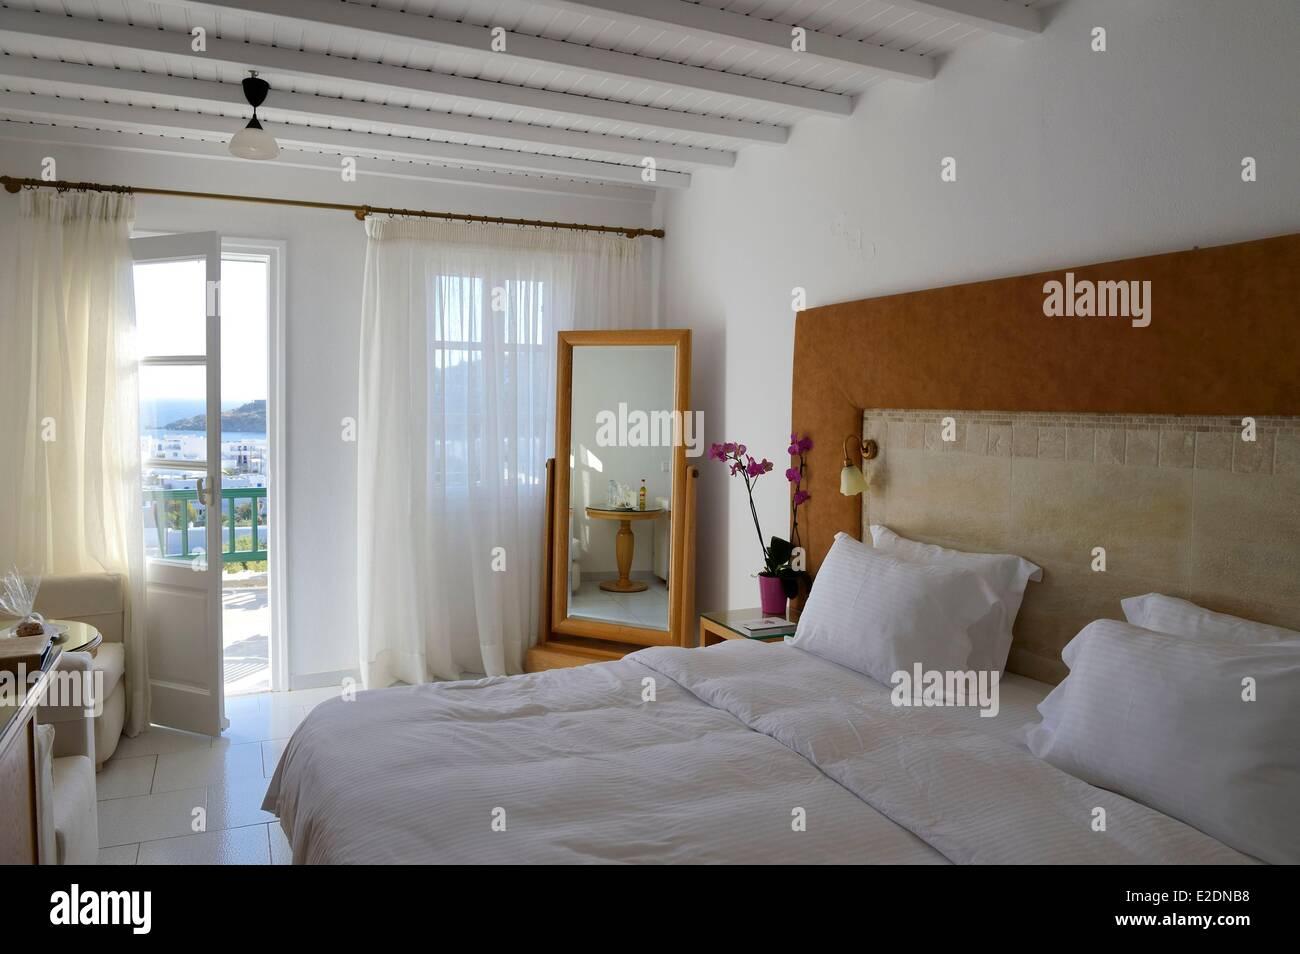 Greece Cyclades islands Mykonos island village of Platis Gialos Relais & Chateaux hotel Myconian Ambassador - Stock Image